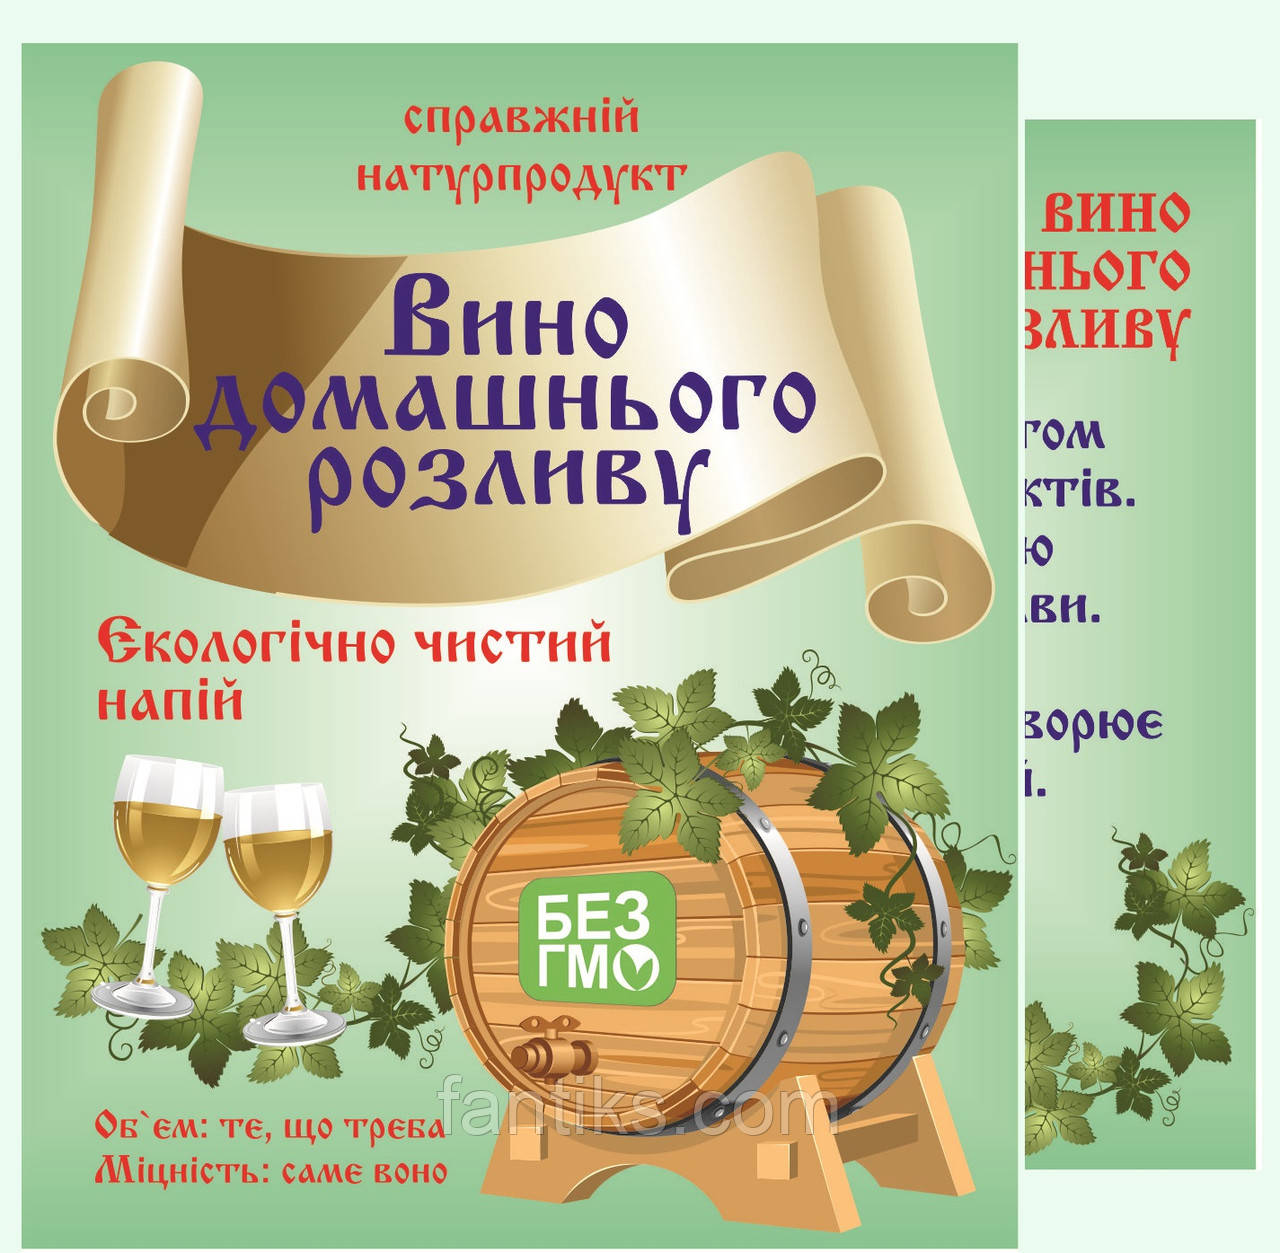 Вино ДОМАШНЬОГО розливу - комплект наклейок на пляшку